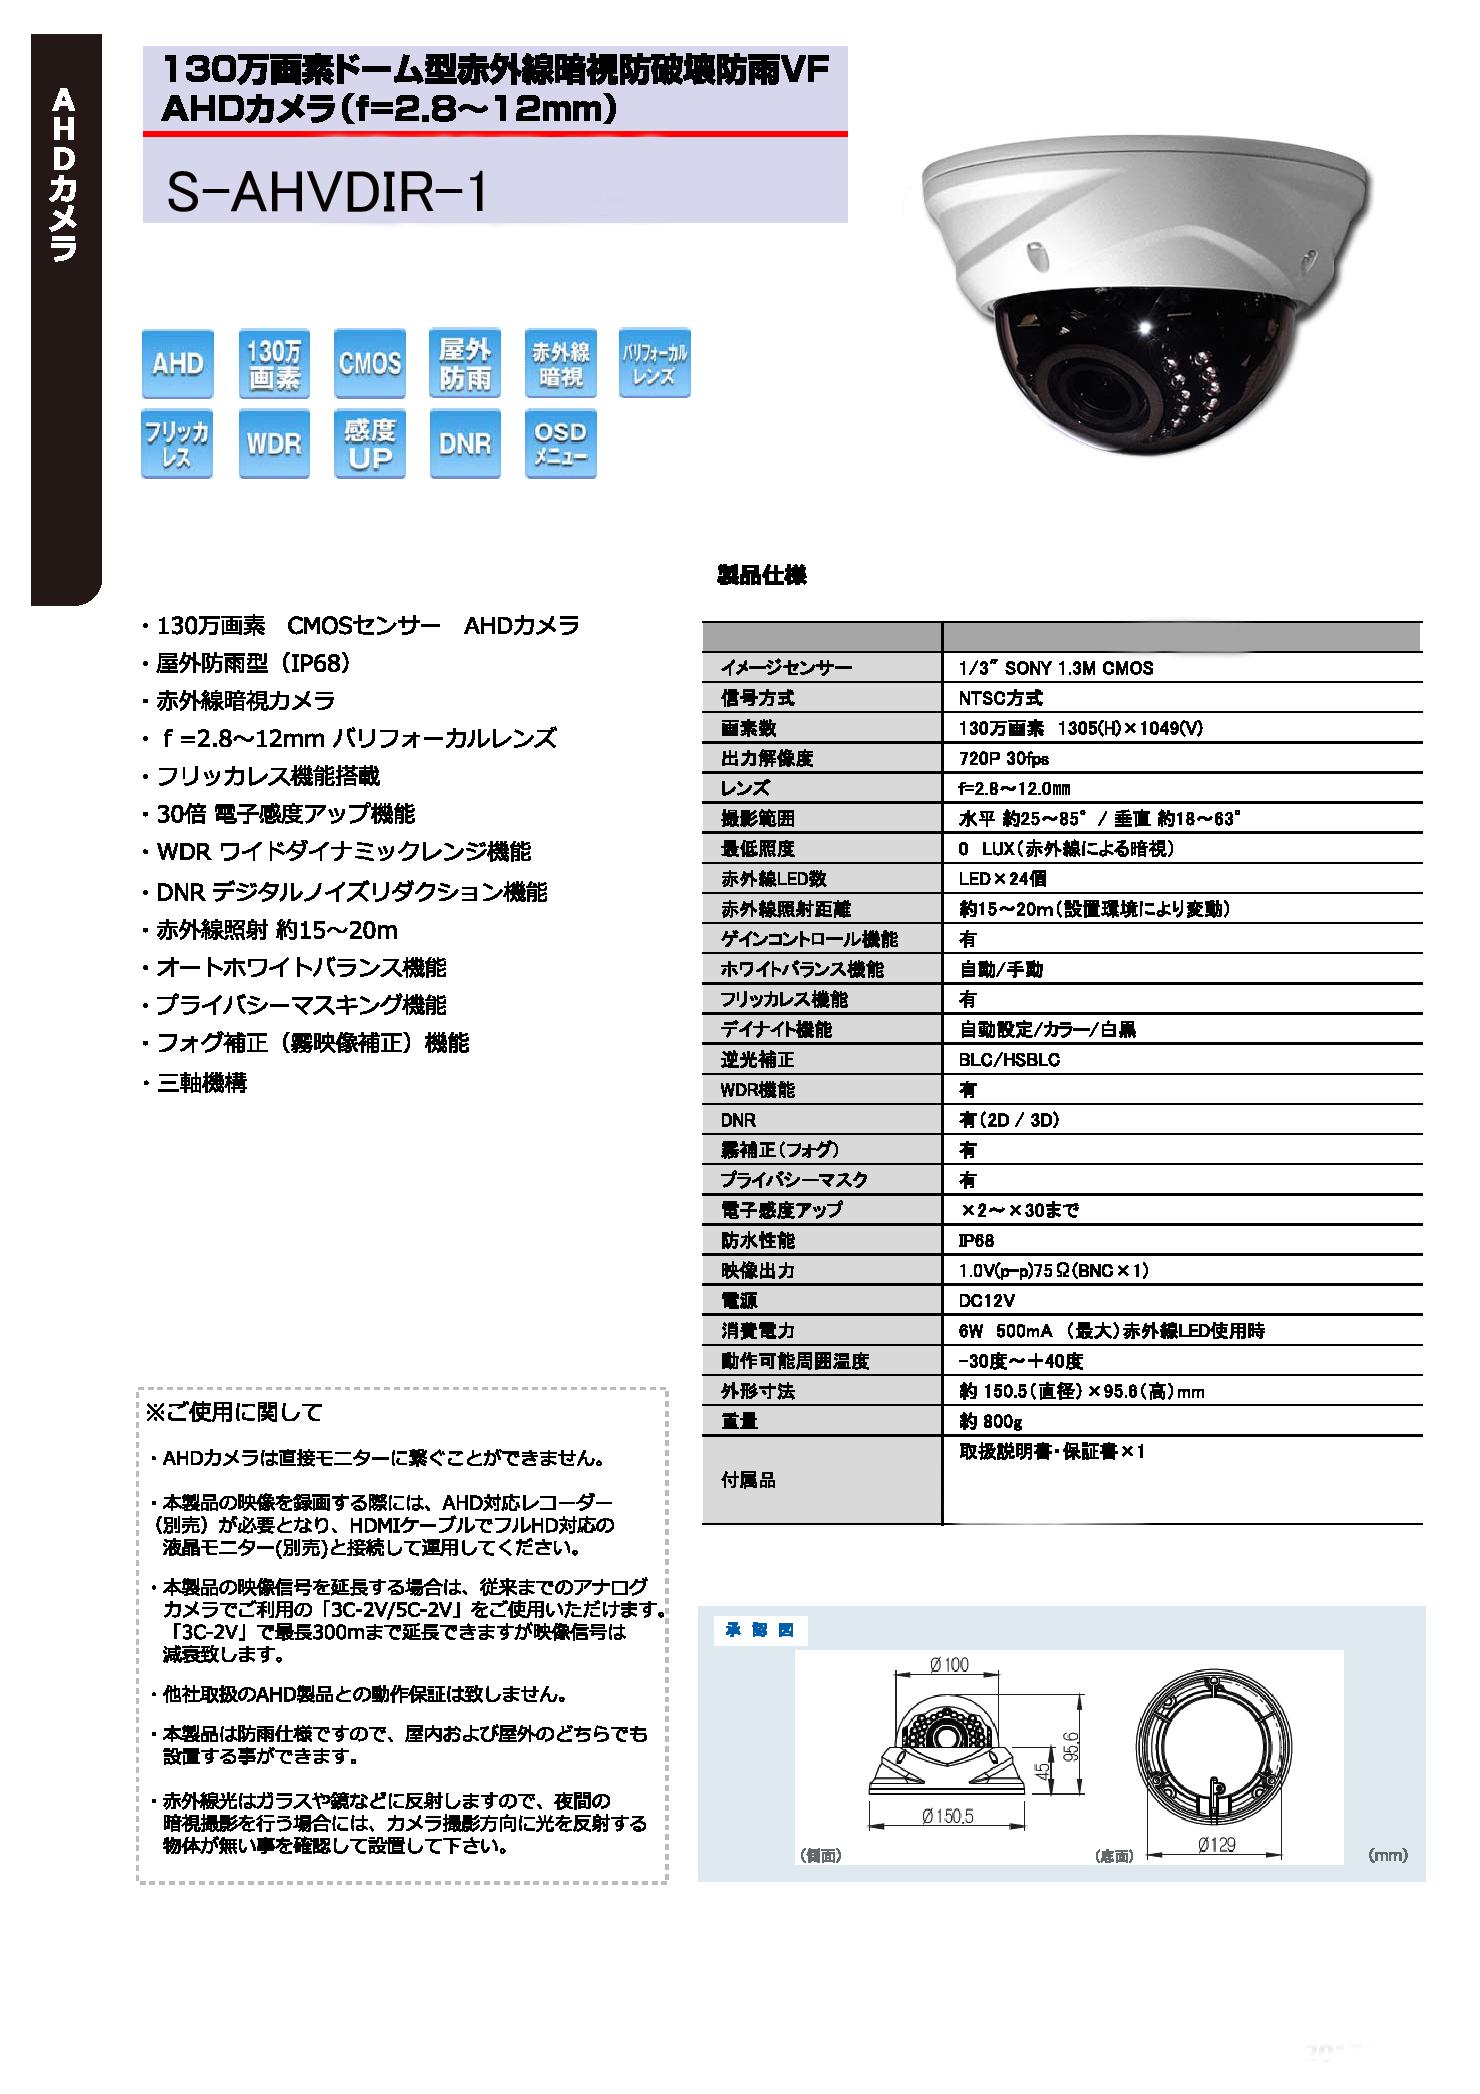 S-AHVDIR-1-catalog_20150913004727647.png